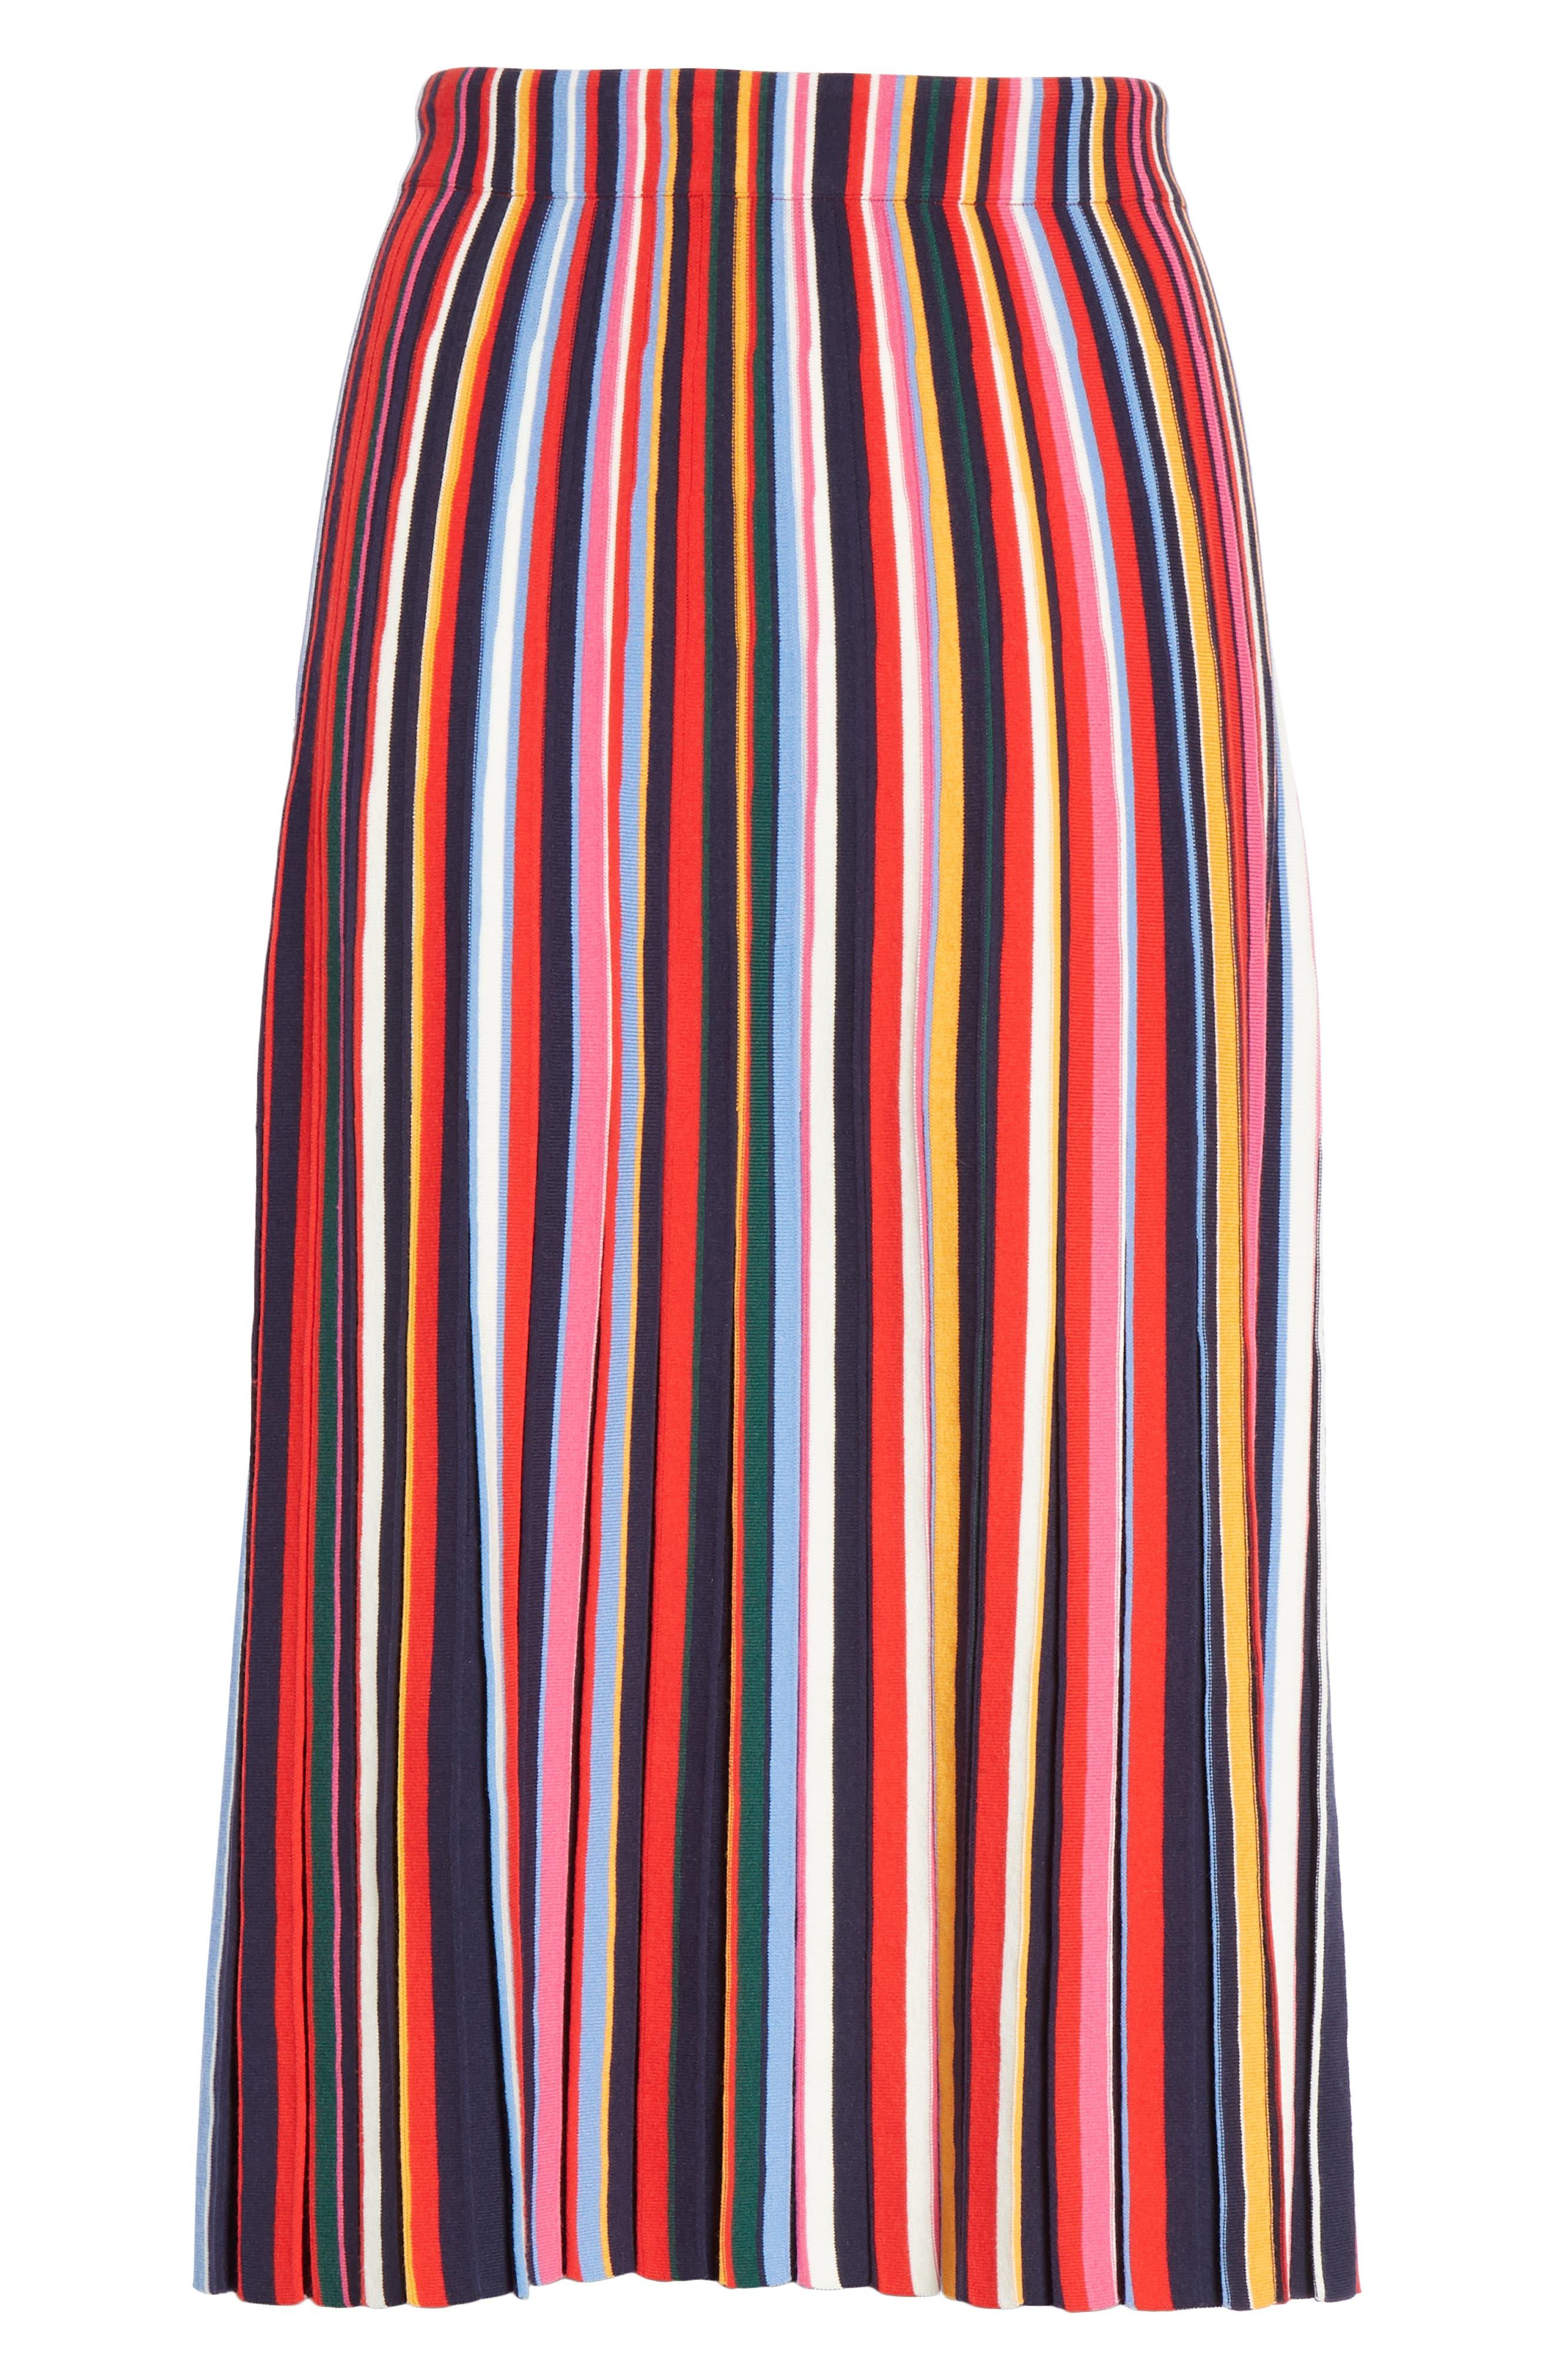 Ellis Stripe Pleated Skirt,                             Alternate thumbnail 6, color,                             405